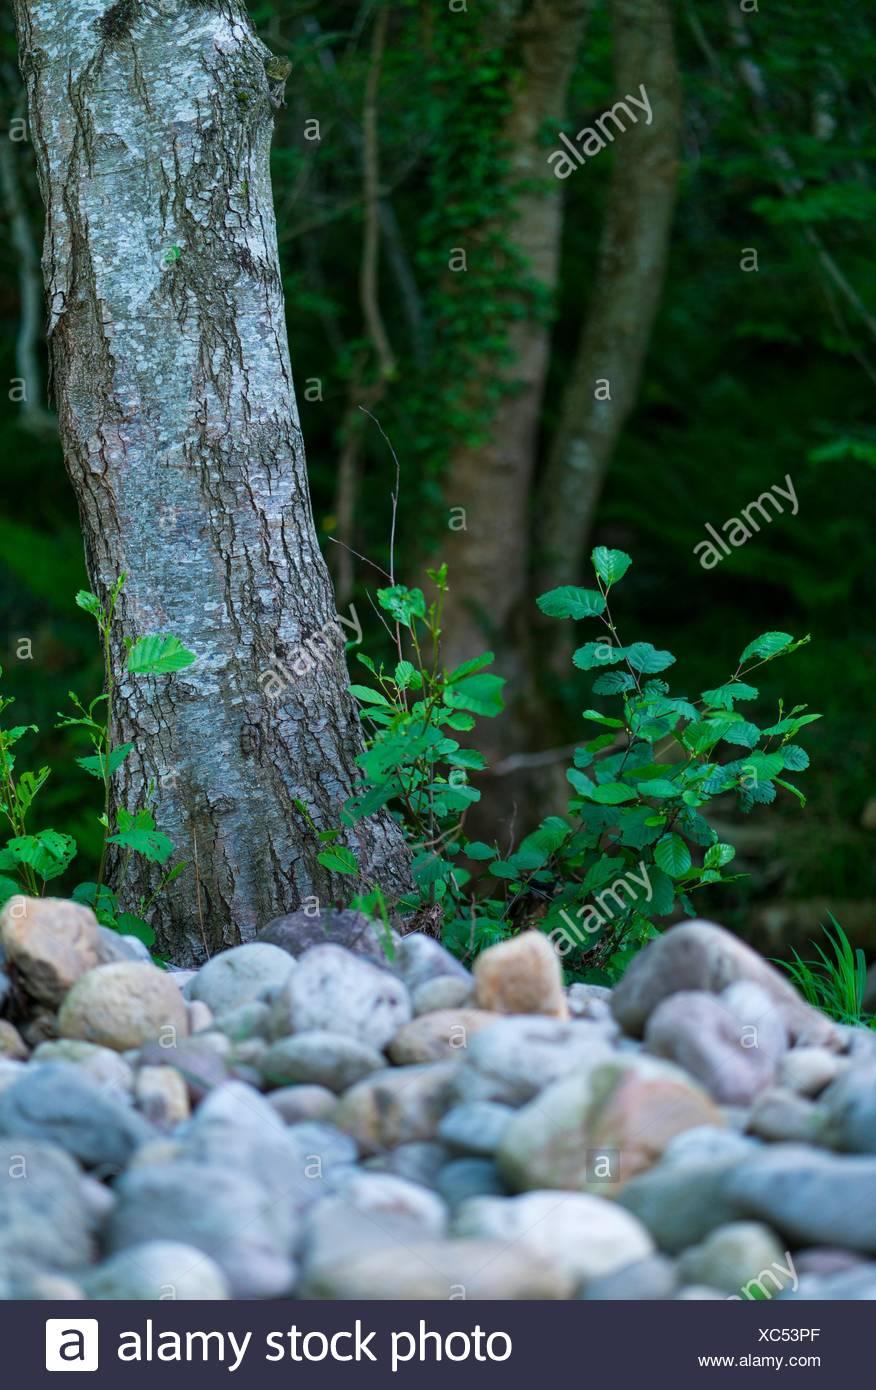 ALDER - ALISO (Alnus glutinosa), the common alder, black alder, European alder or just alder, is a species of tree in the family Betulaceae, native - Stock Image